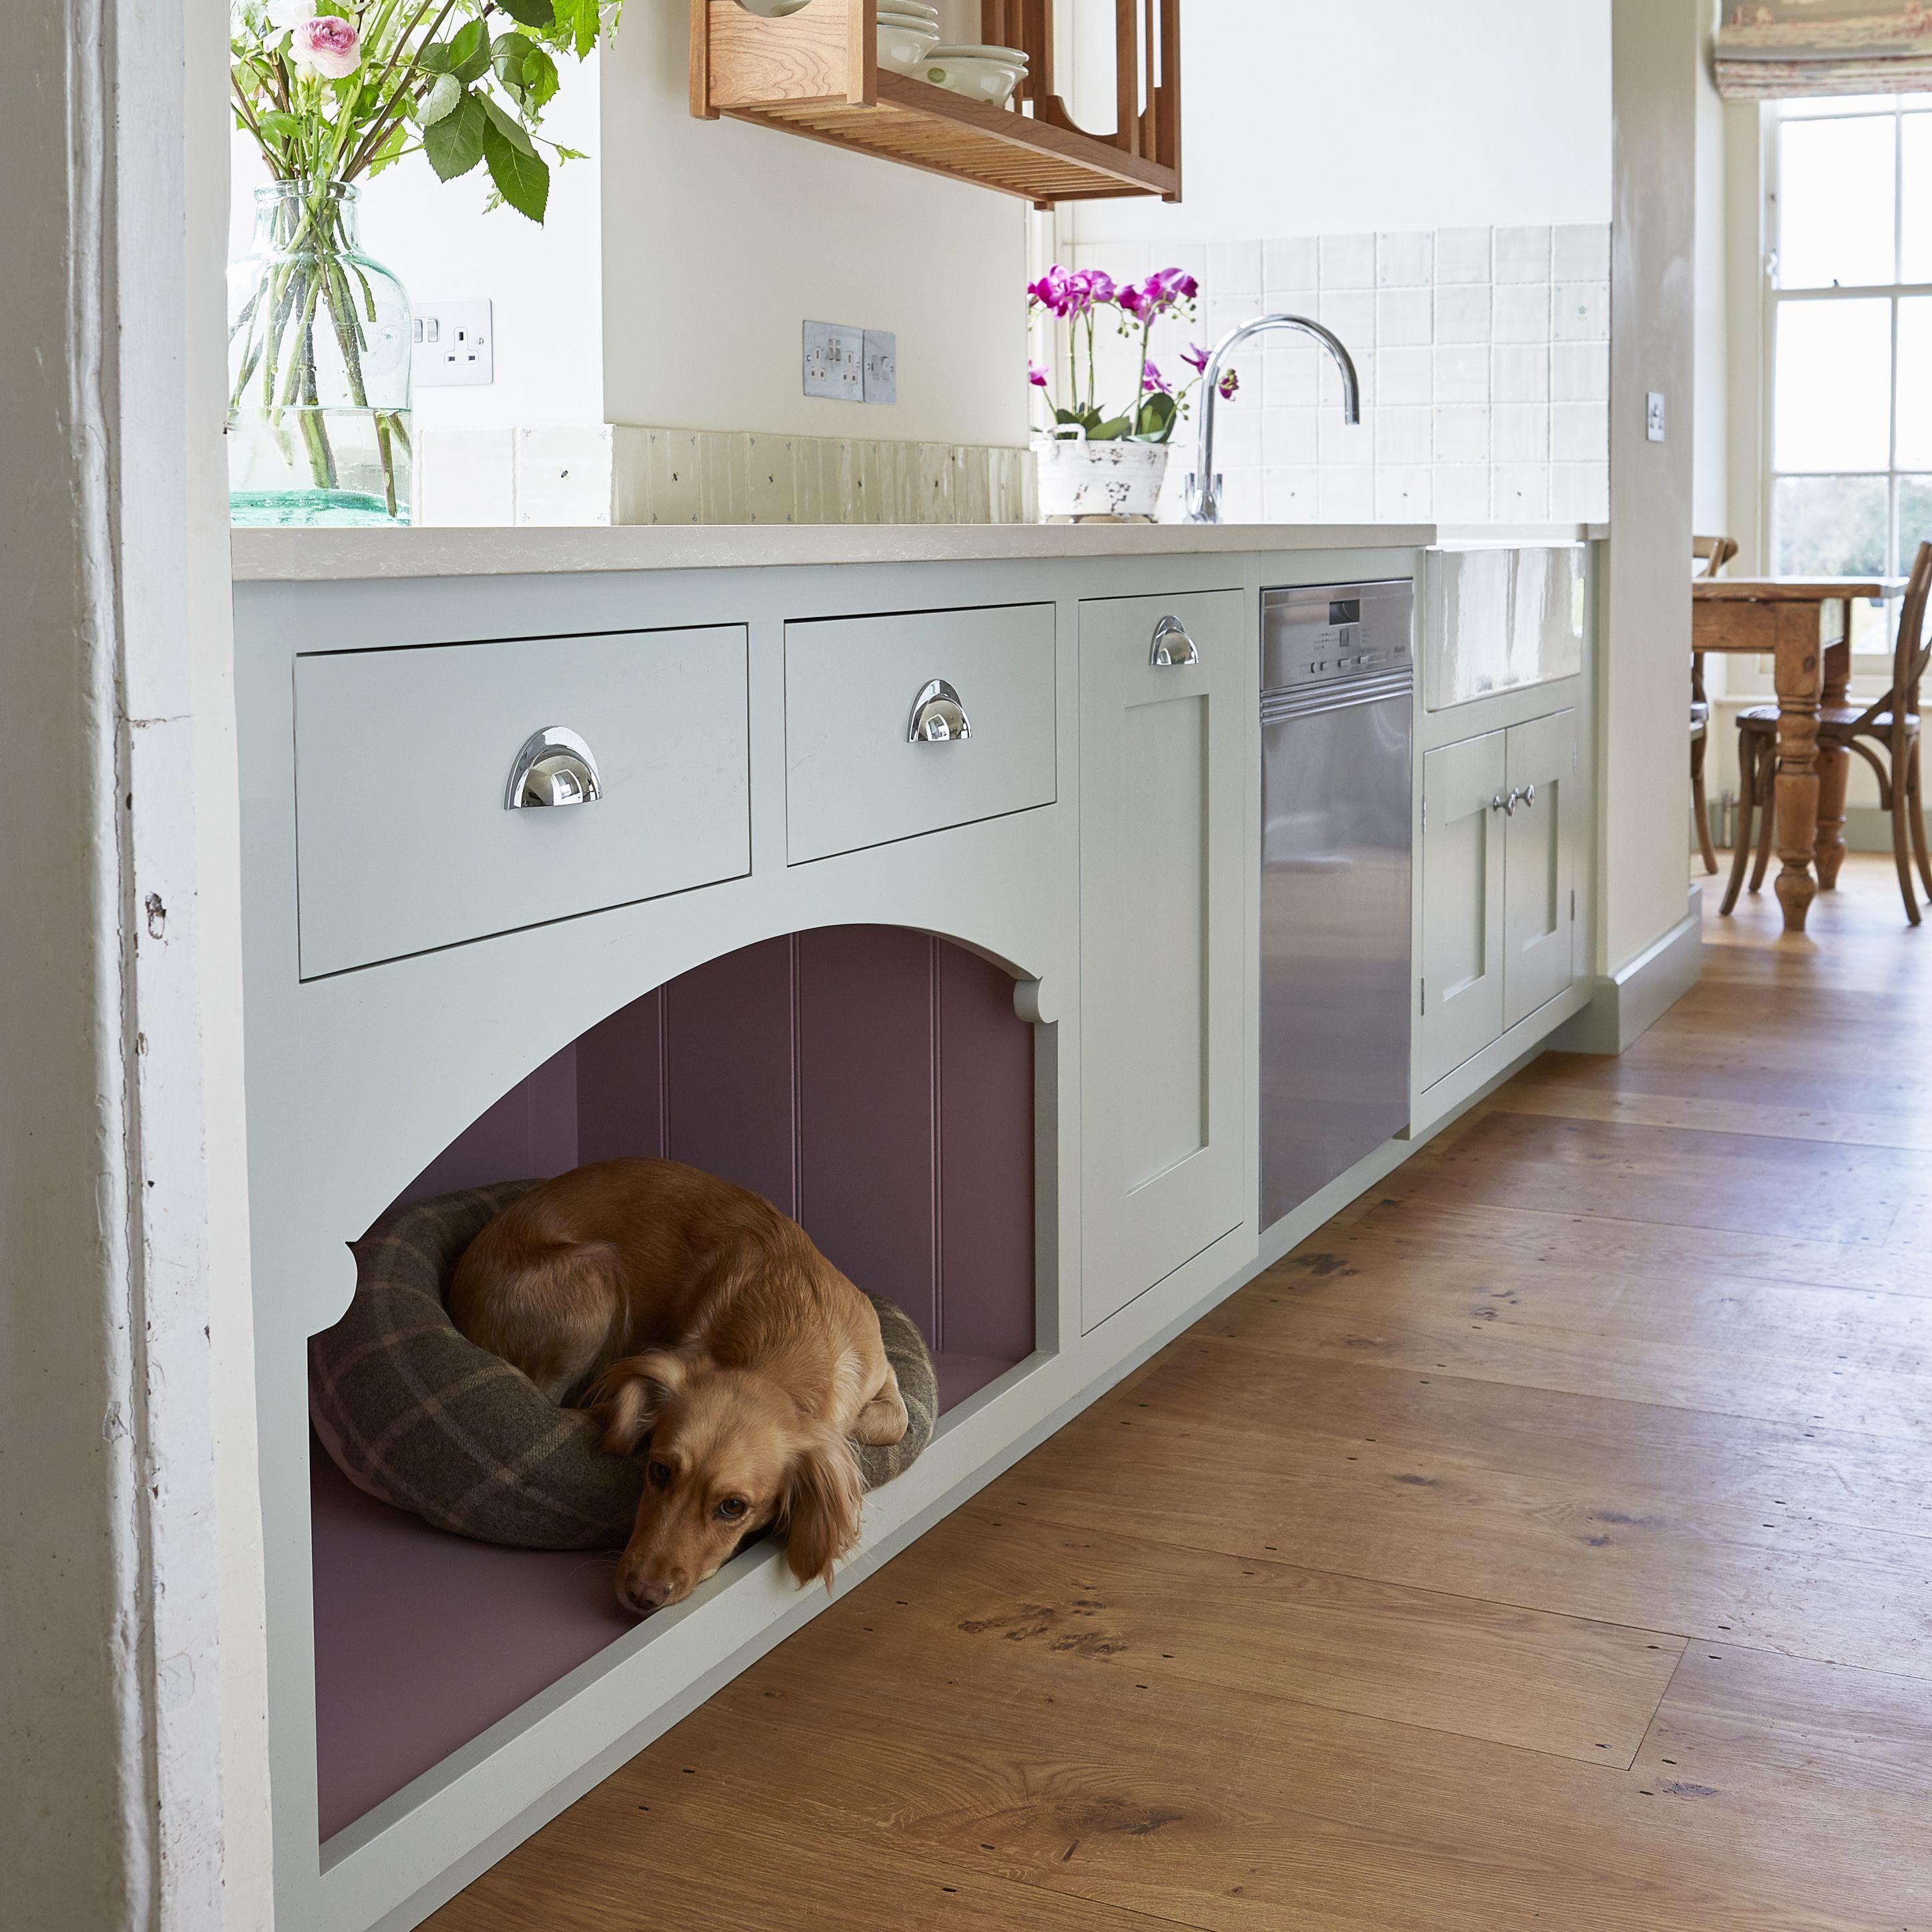 Home Dog house diy, Dog rooms, Cheap dog houses